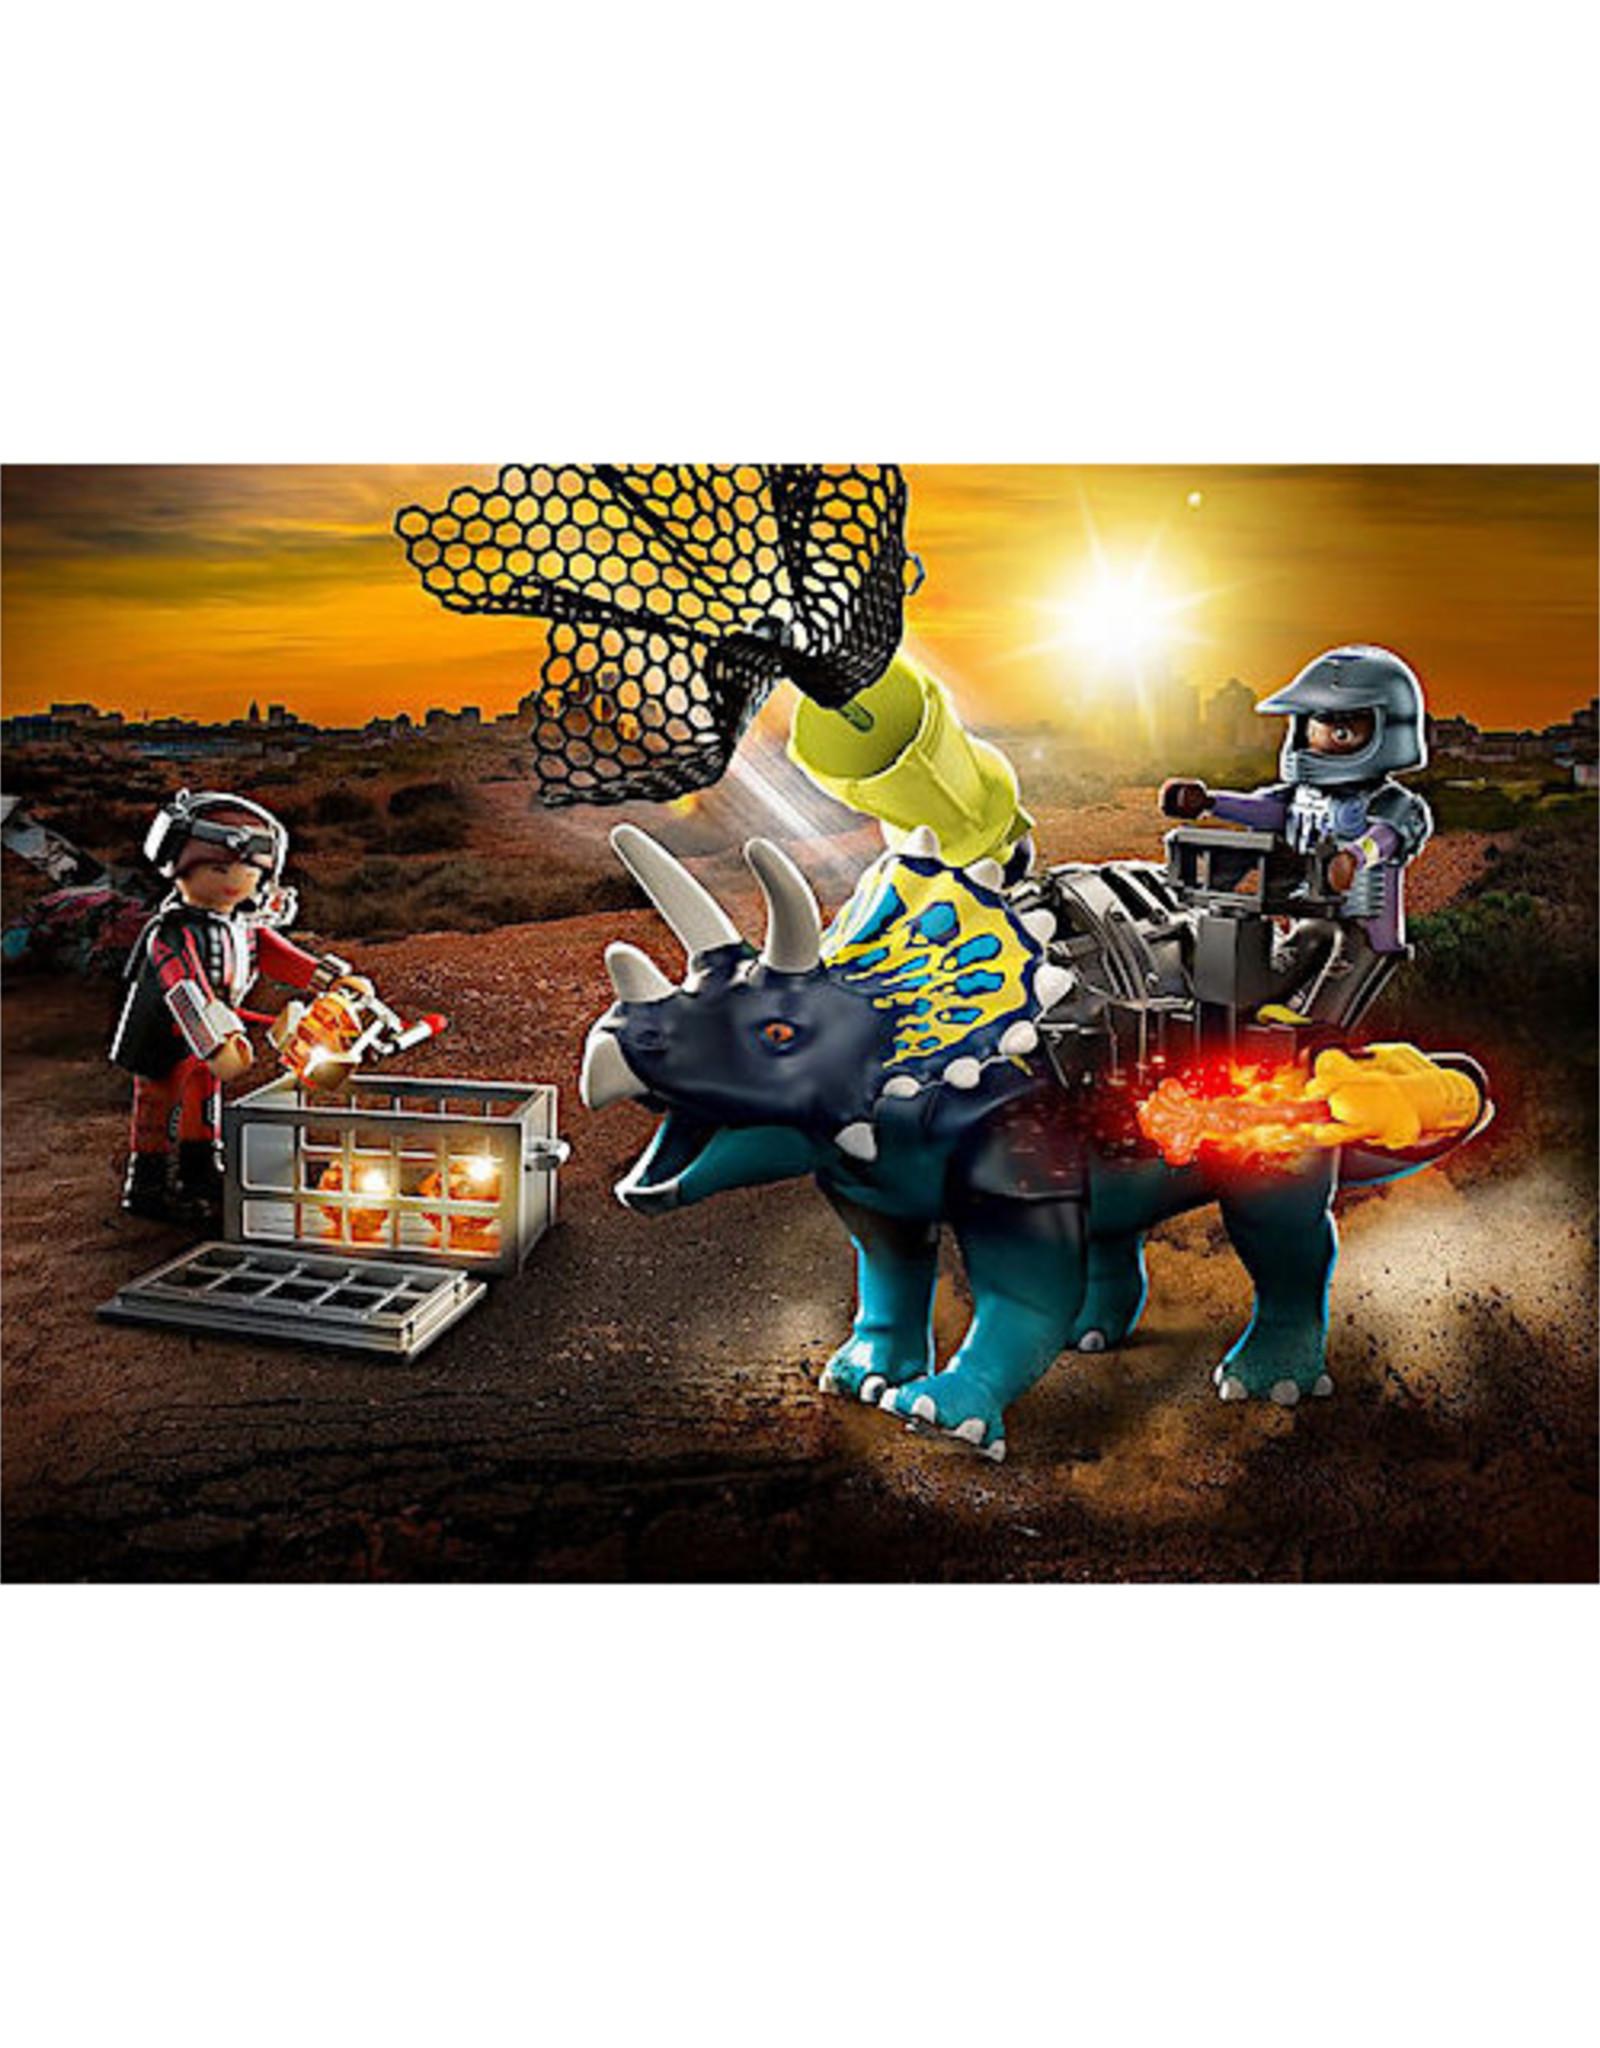 Playmobil Triceratops: Battle for the Legendary Stones